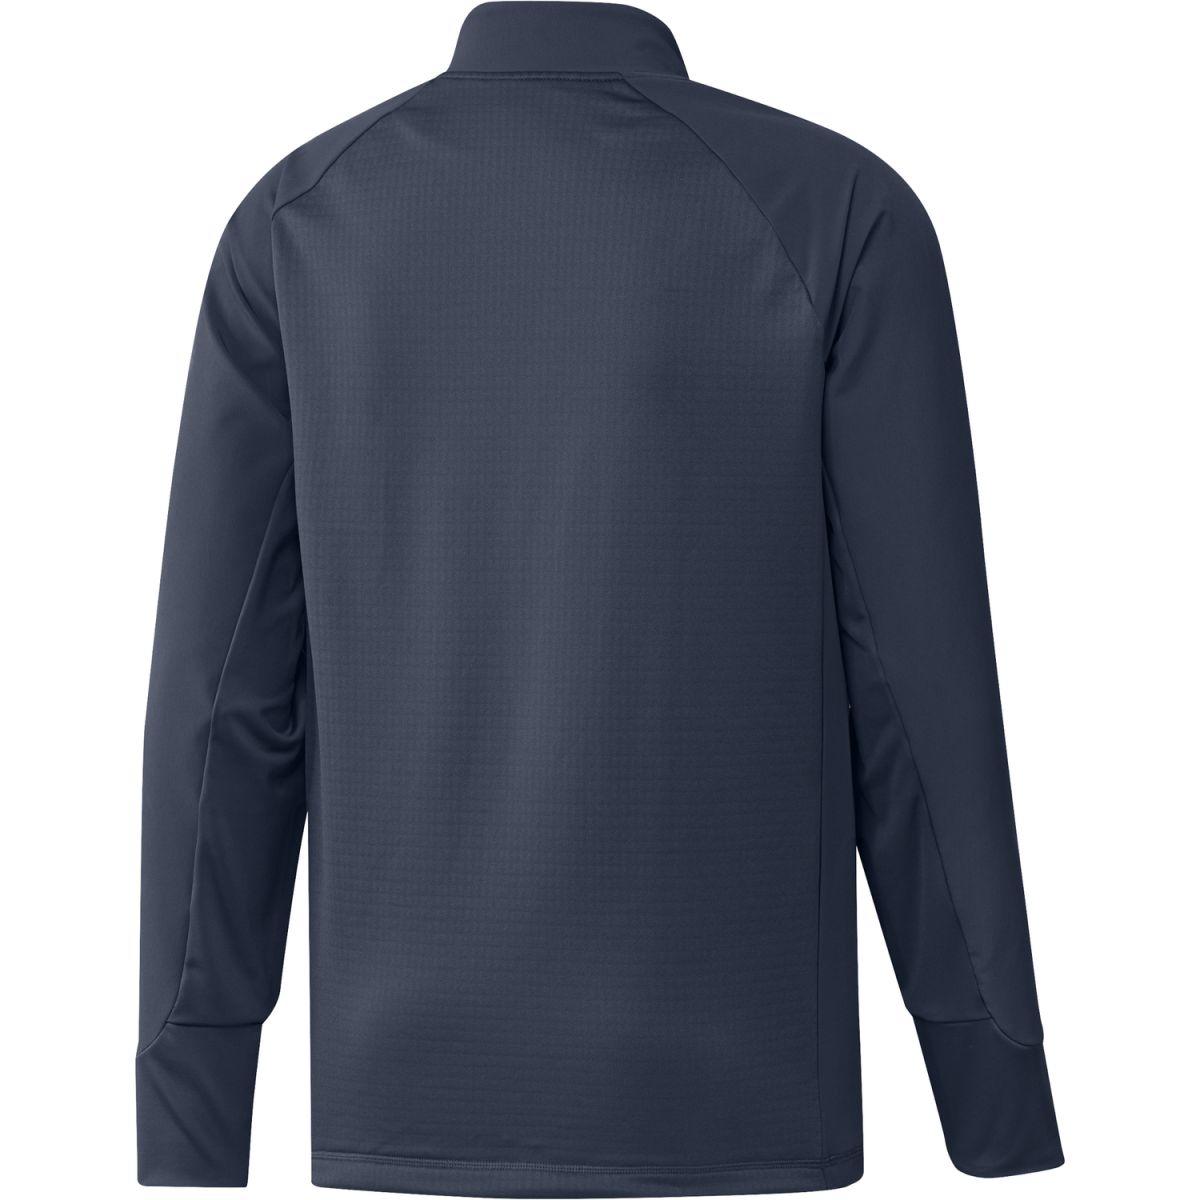 adidas jacket hybrid navy s